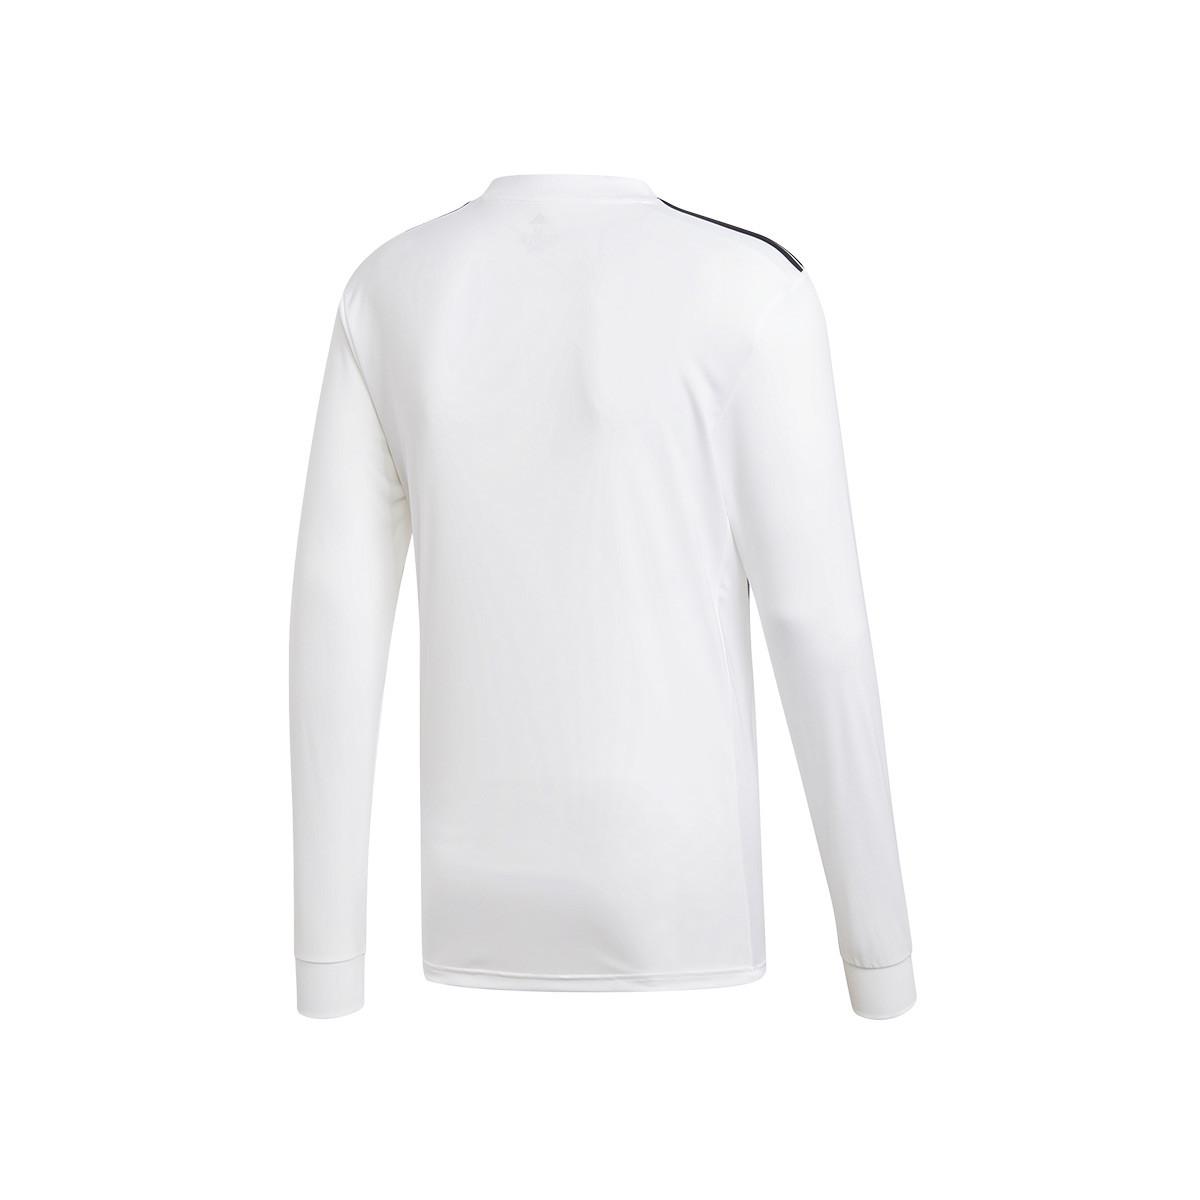 ac6ccb4b Jersey adidas Striped 19 m/l White-Black - Football store Fútbol Emotion